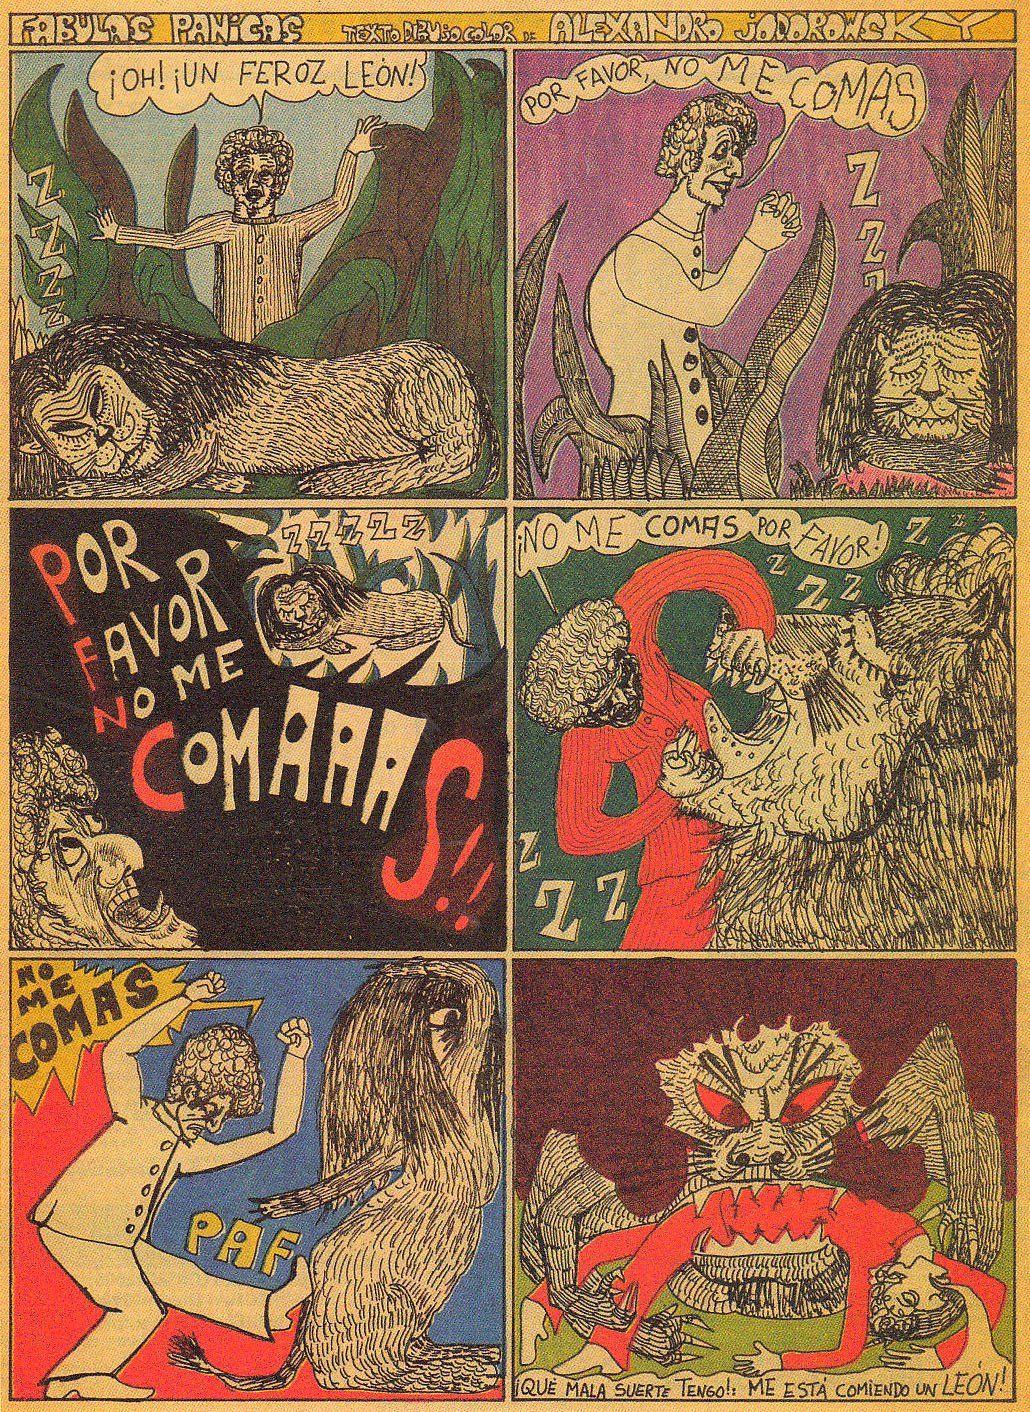 comics by alejandro jodorowsky (via http://fabulaspanicas.blogspot.com)